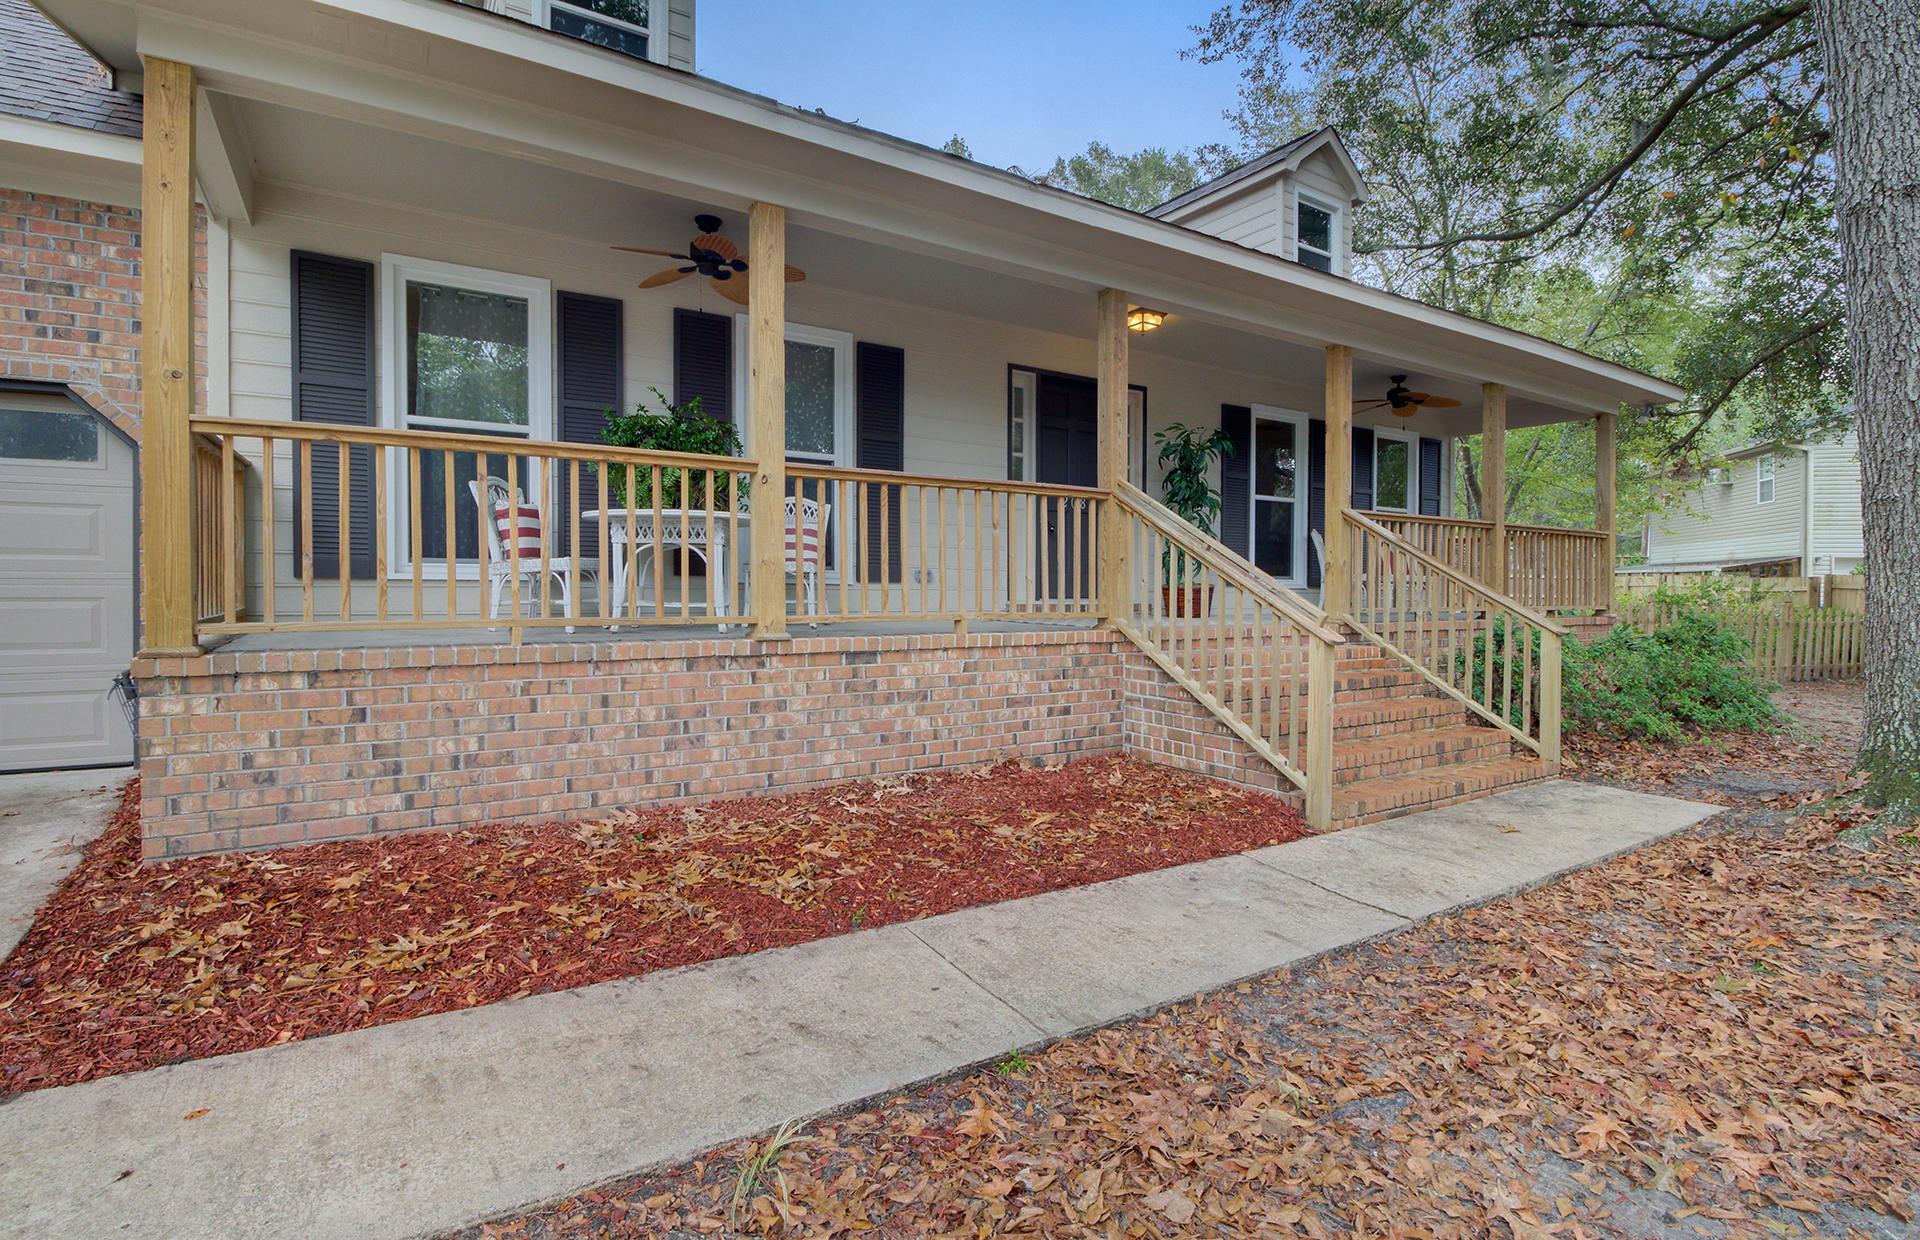 White Church Place Homes For Sale - 208 Glebe, Summerville, SC - 0